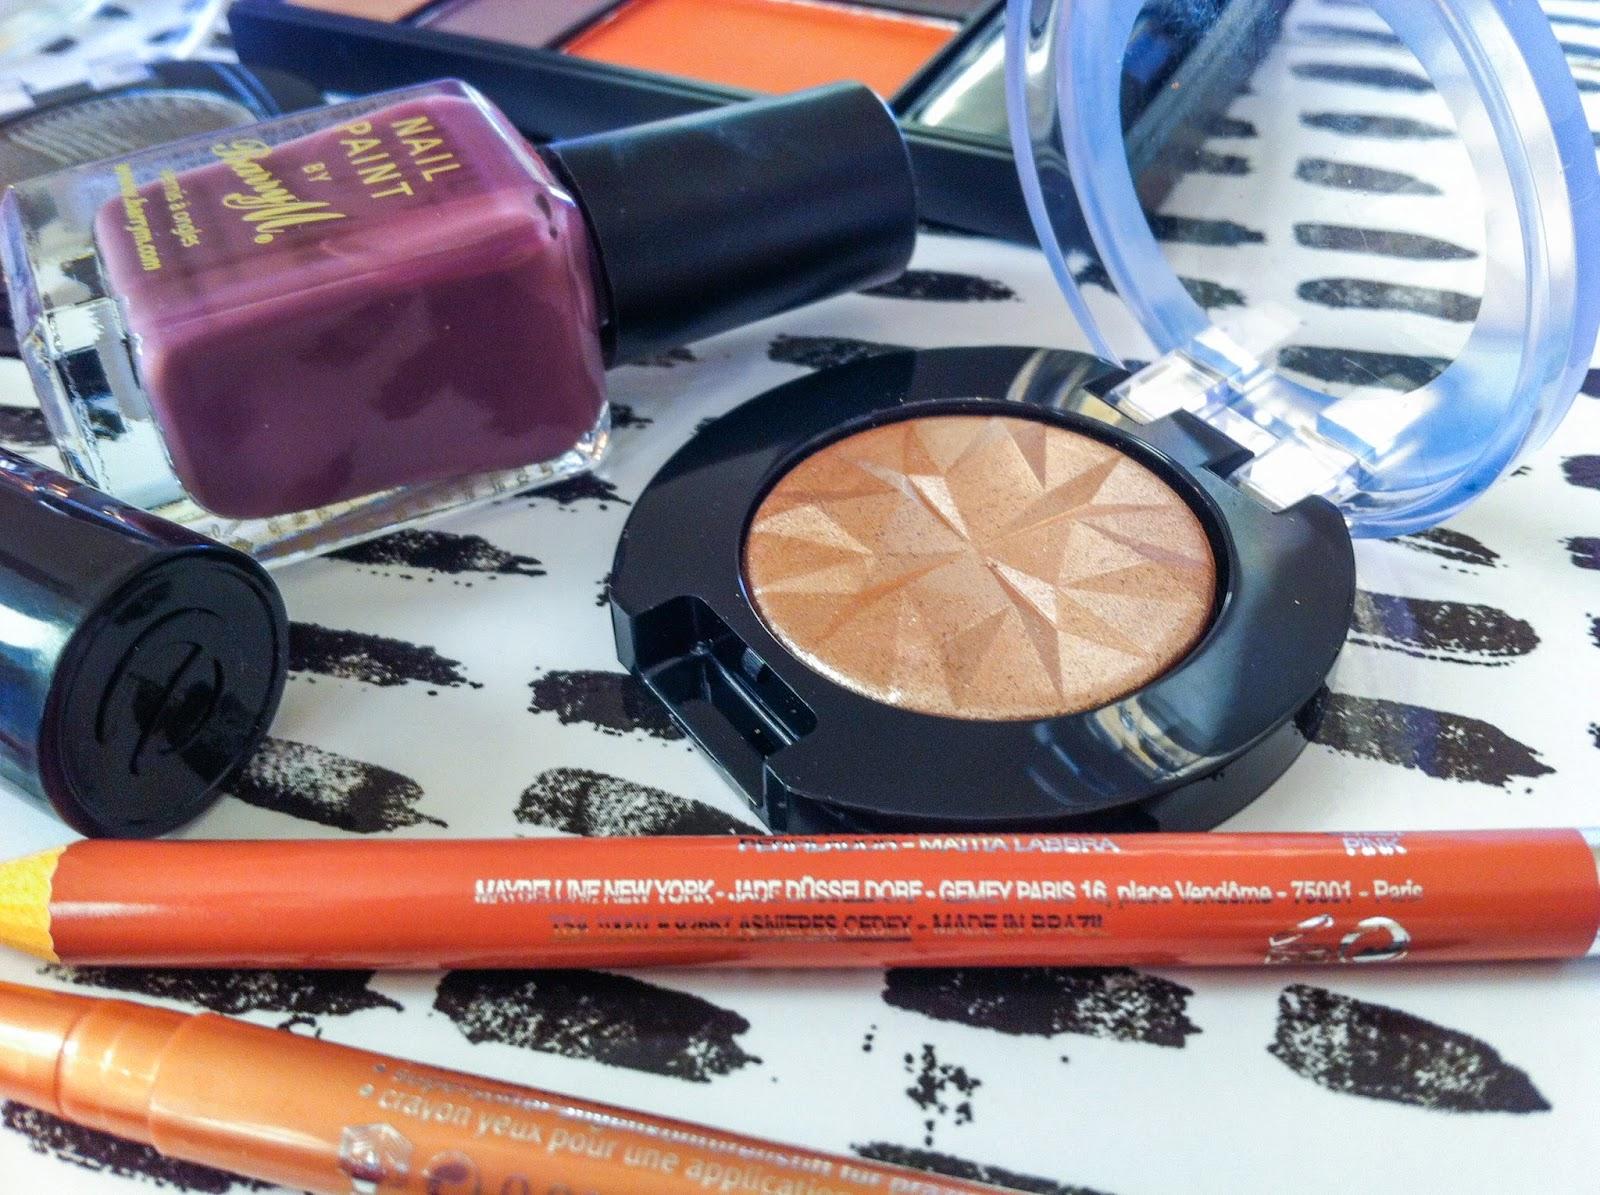 Haul drugstore UK Boots Essence Makeup Beauty